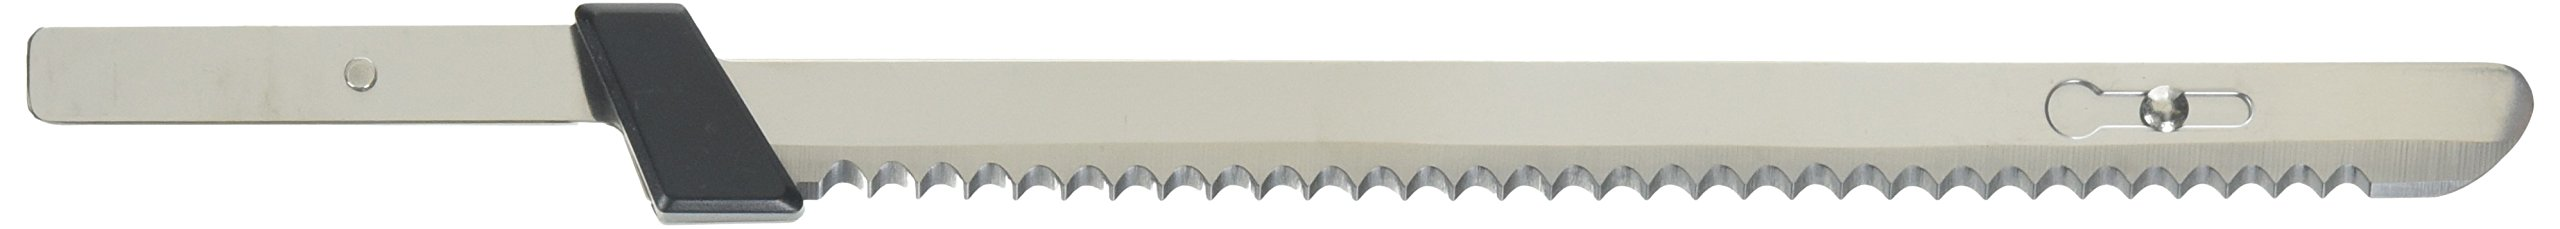 Waring Commercial EK120BB Bread Blade, Silver